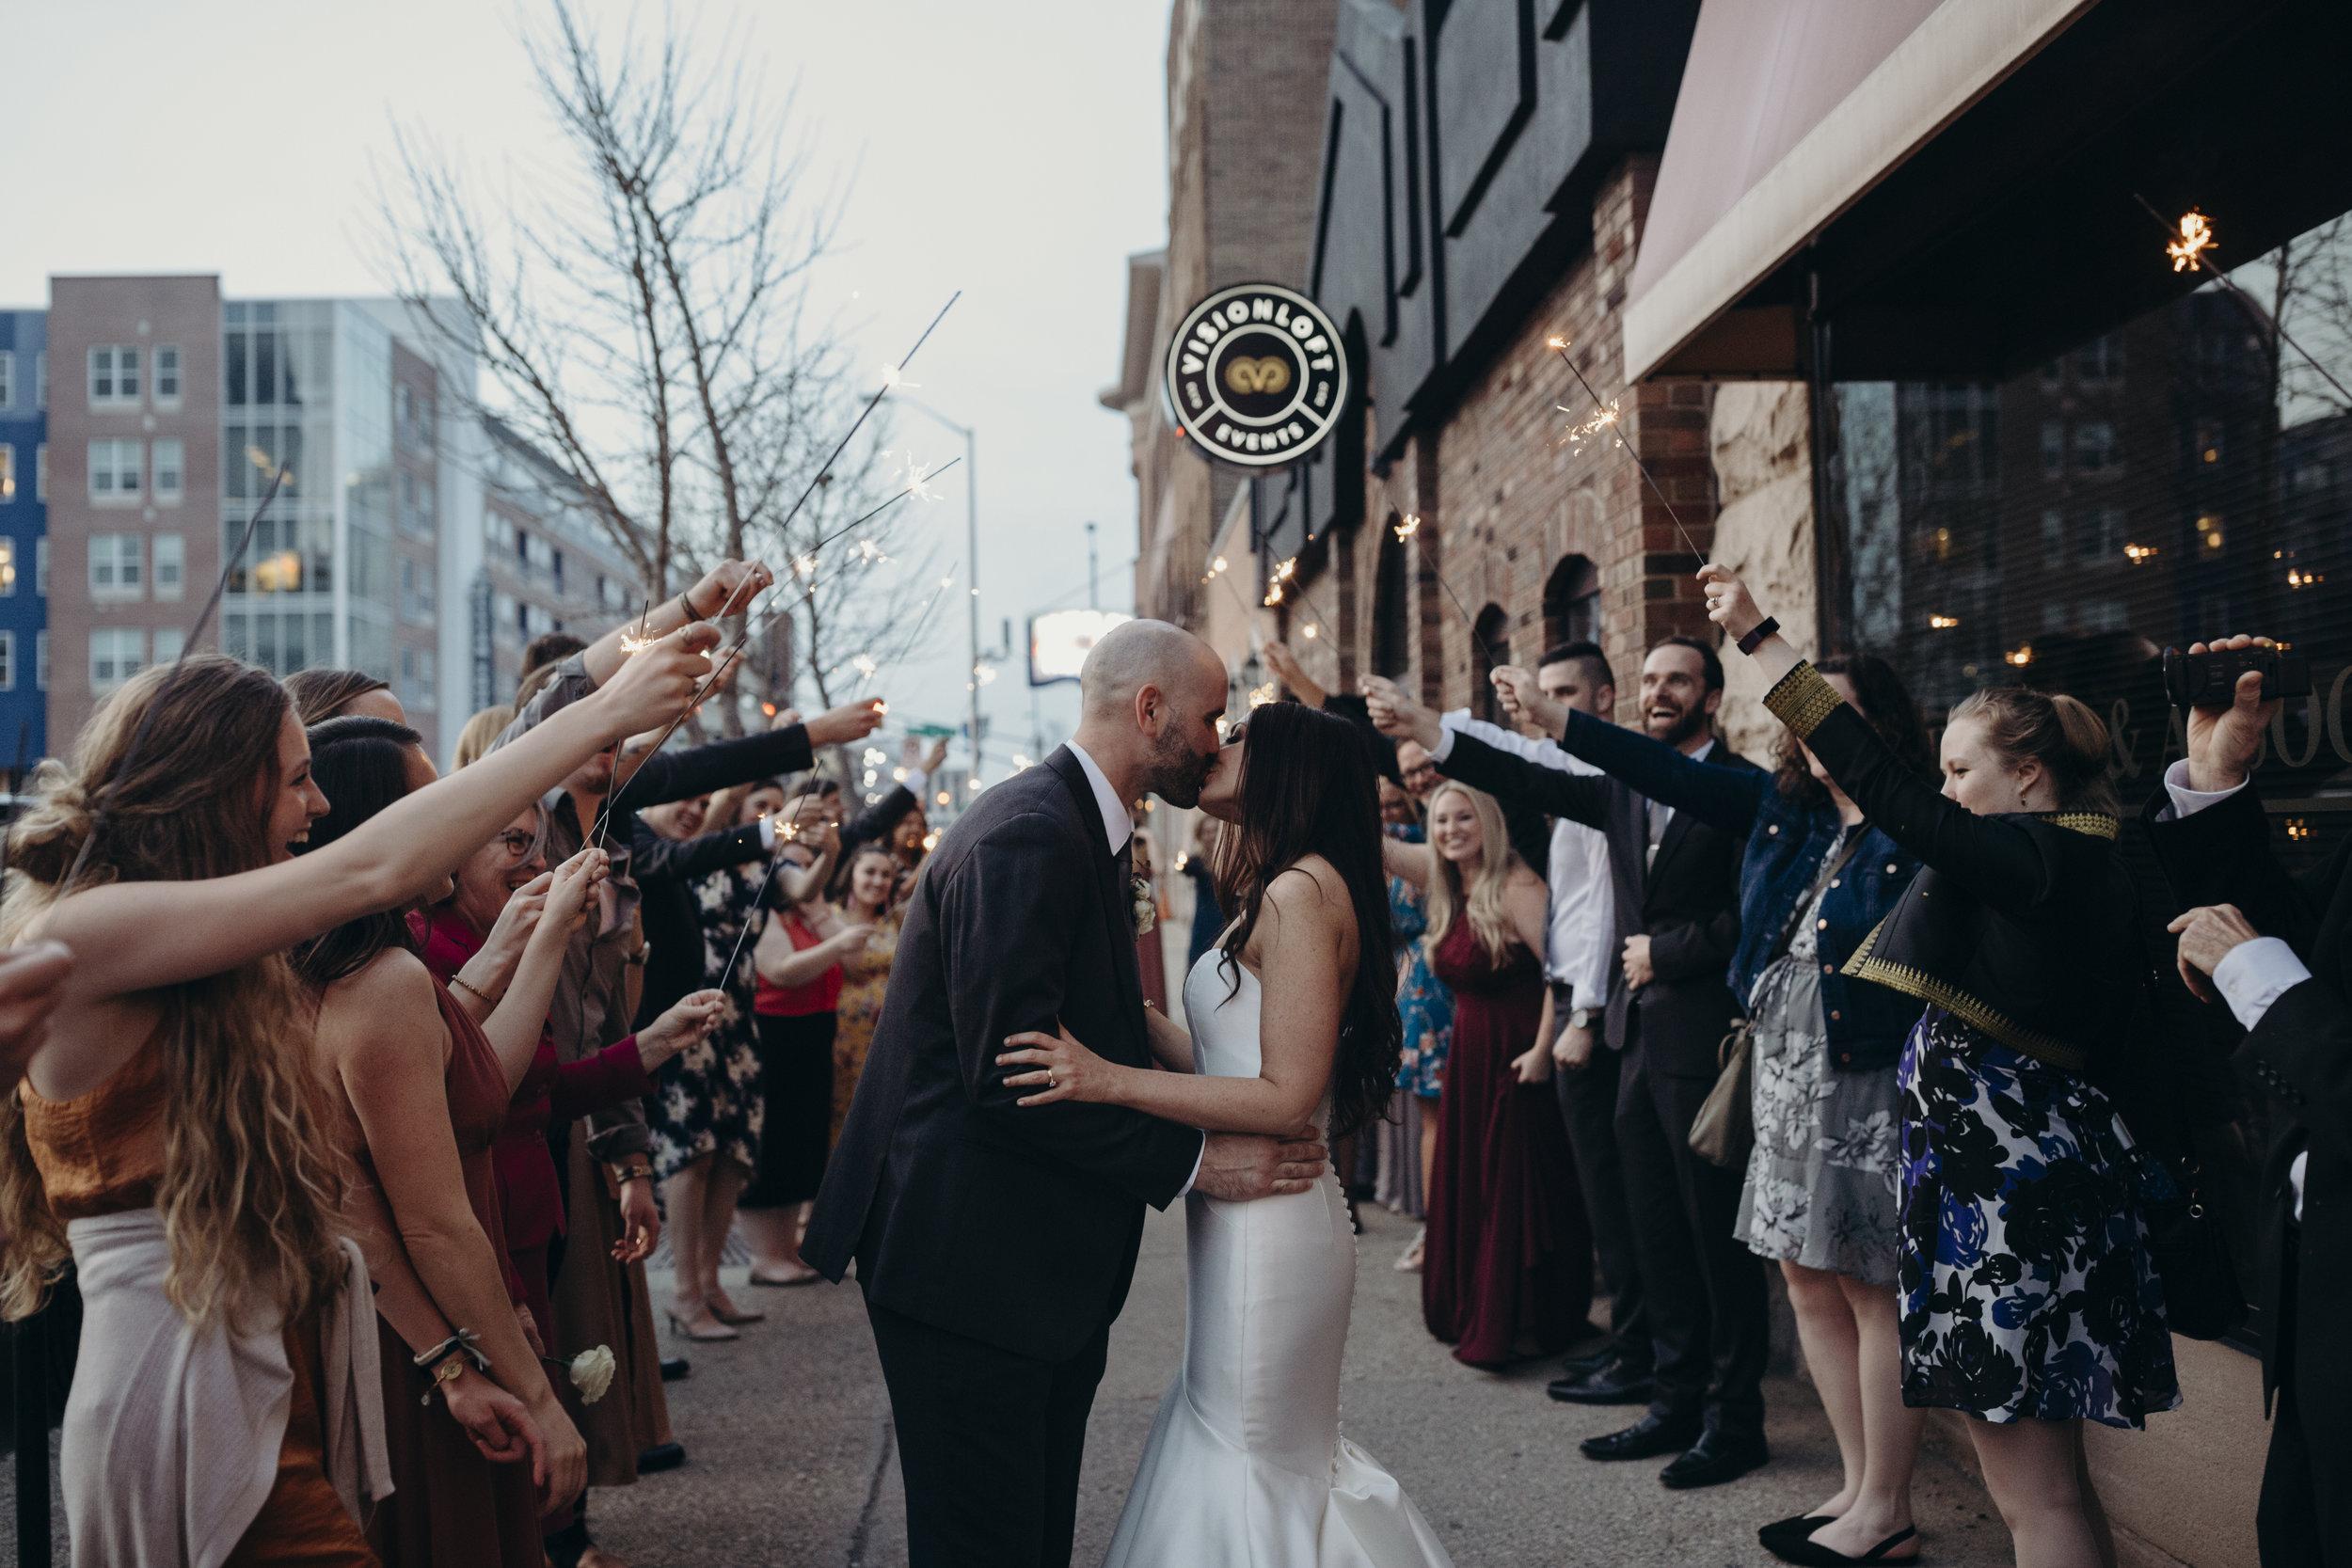 visionlofteventsweddingphotography.jpg